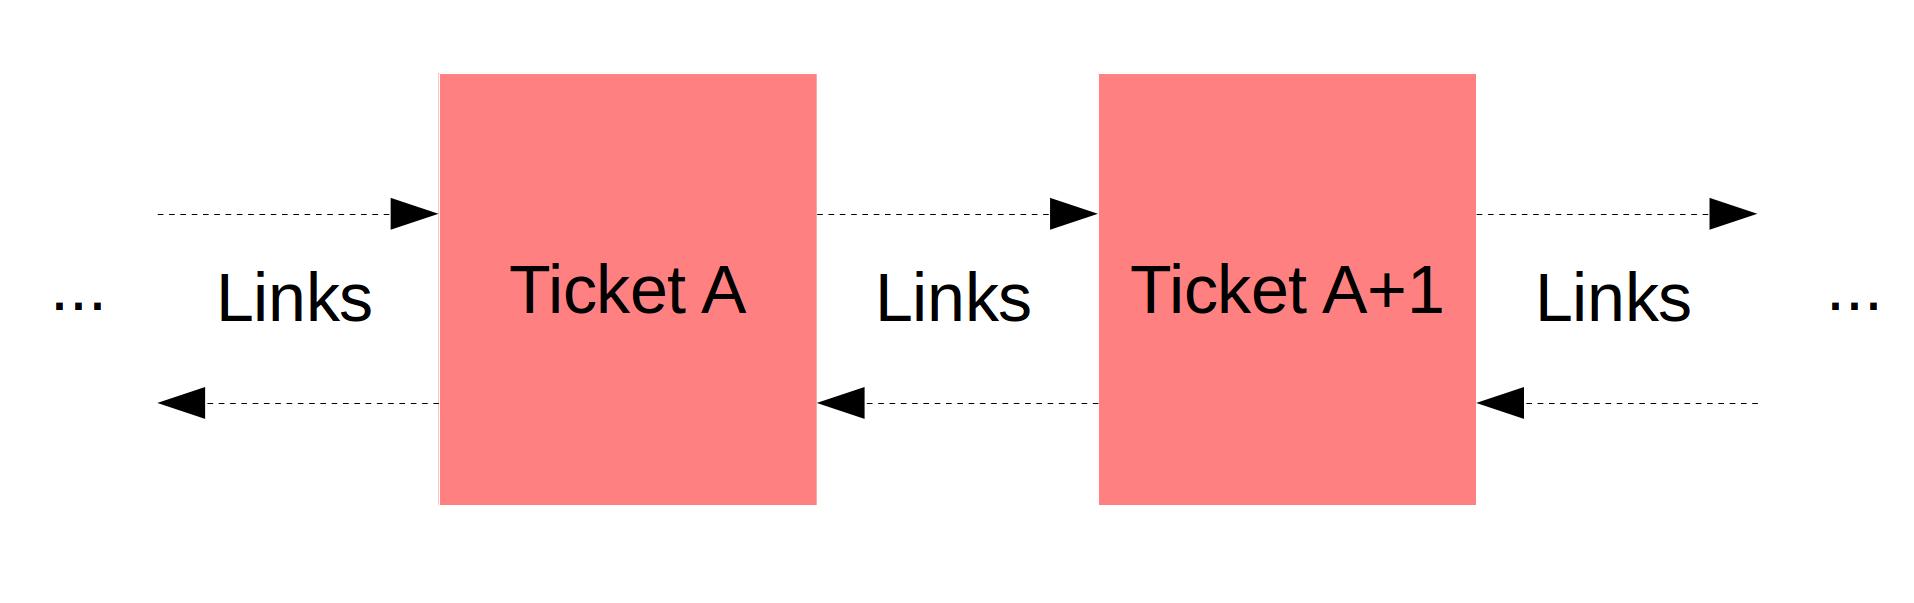 Tickets linking